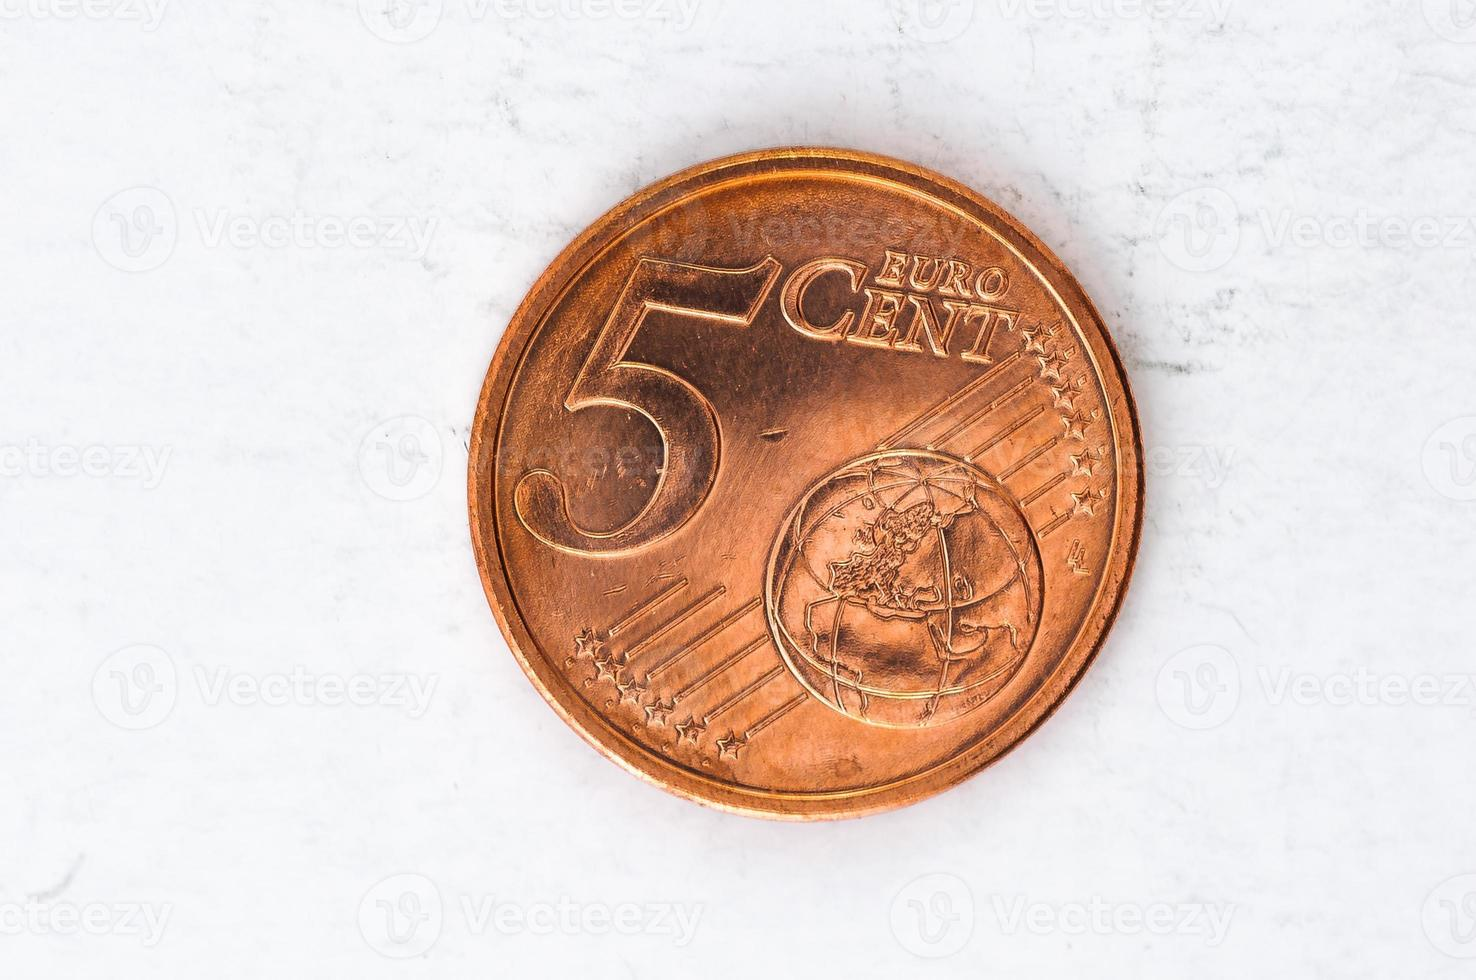 5-Euro-Cent-Münze mit Frontside-Look foto